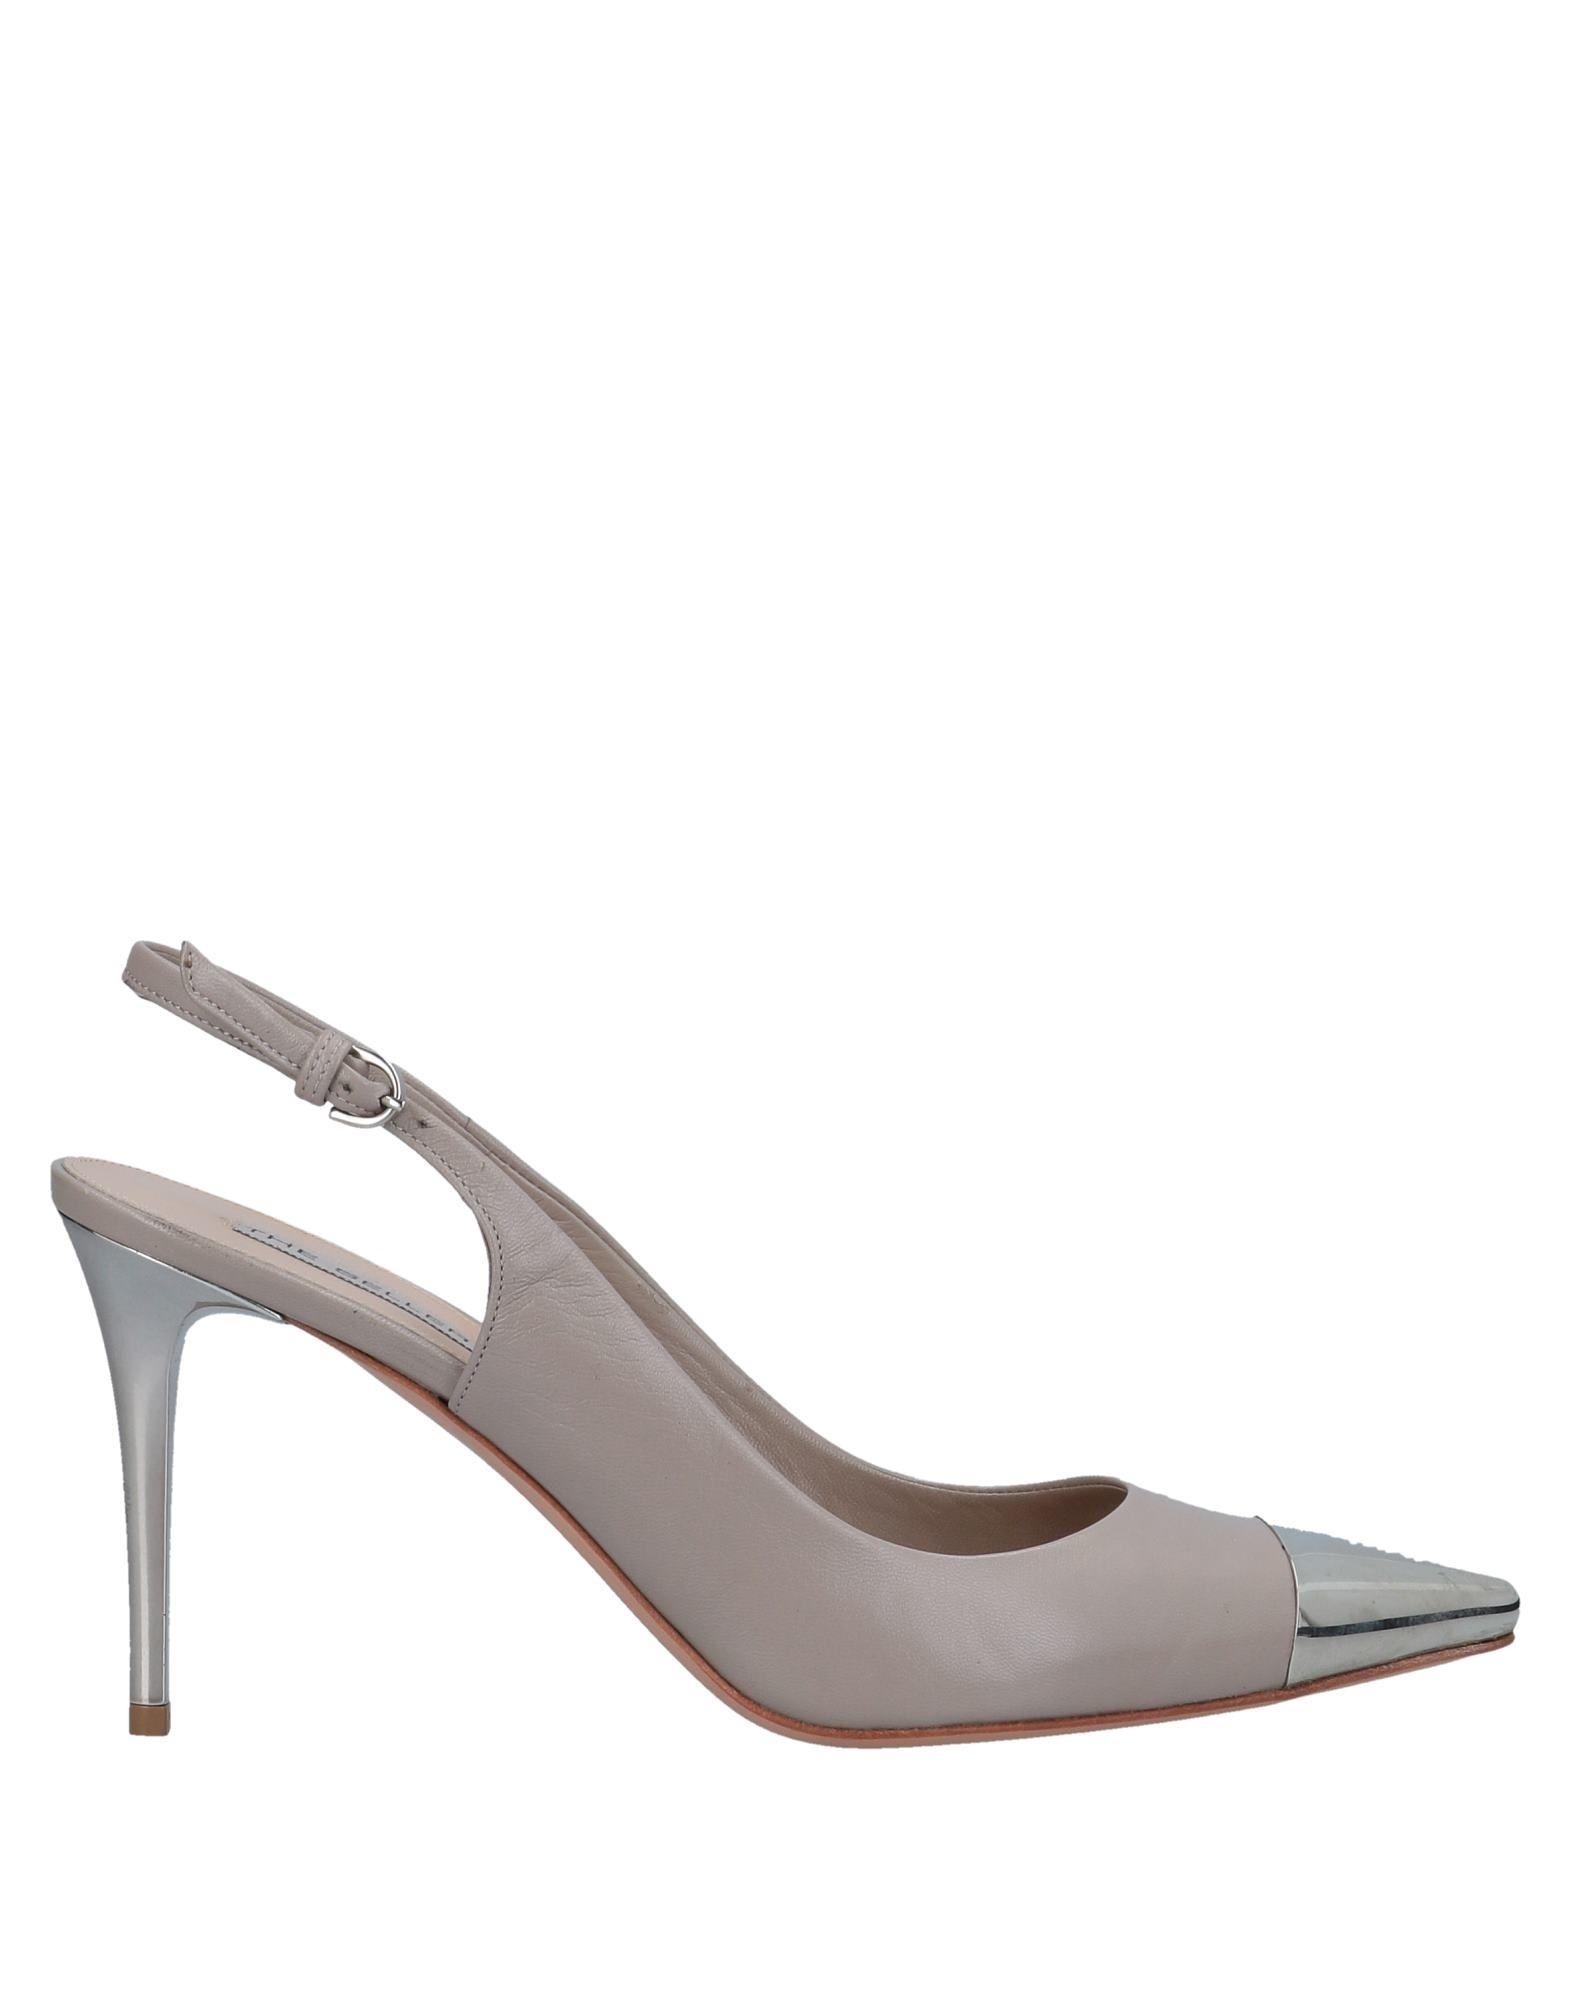 Sandali Unisa Donna - 11525082RG comode Nuove offerte e scarpe comode 11525082RG 4c2b02